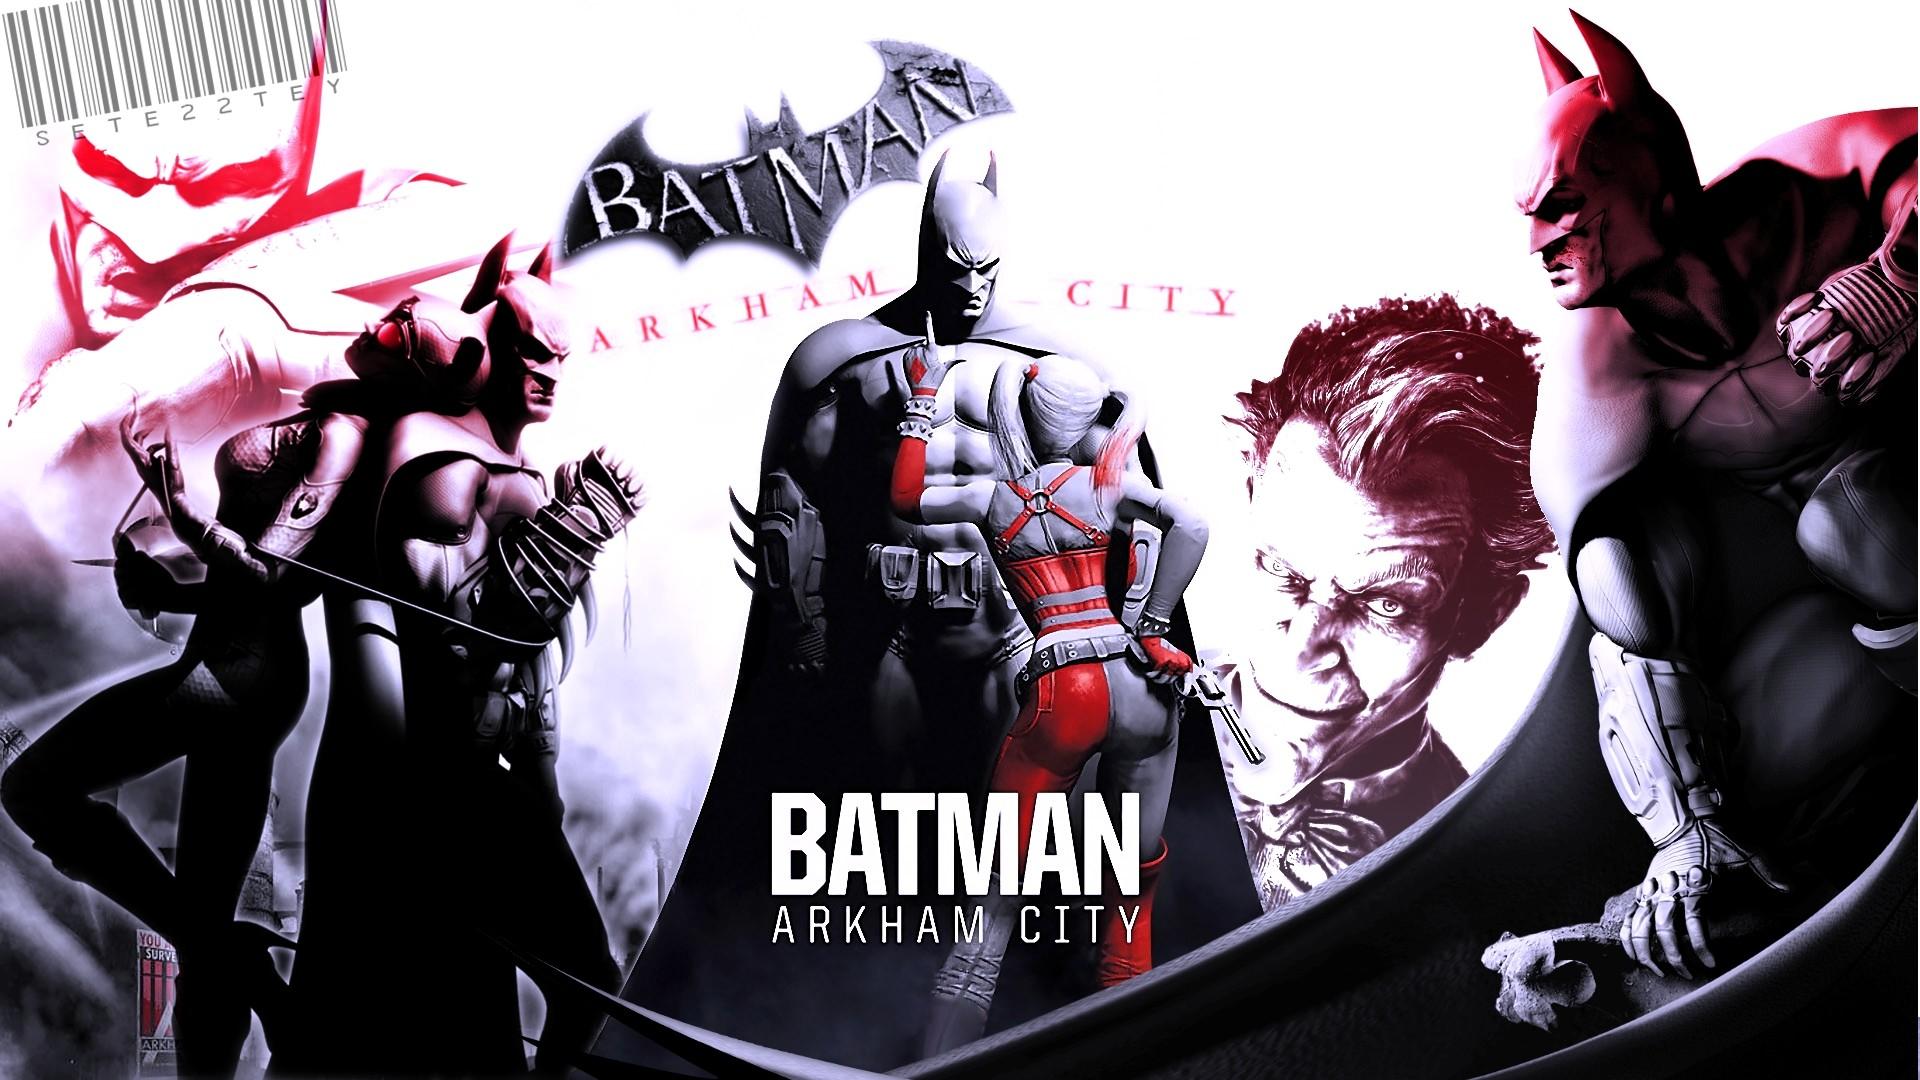 Ultra HD batman harley quinn | Ultra HD Wallpapers | Pinterest | Harley  quinn, Hd wallpaper and Art girl